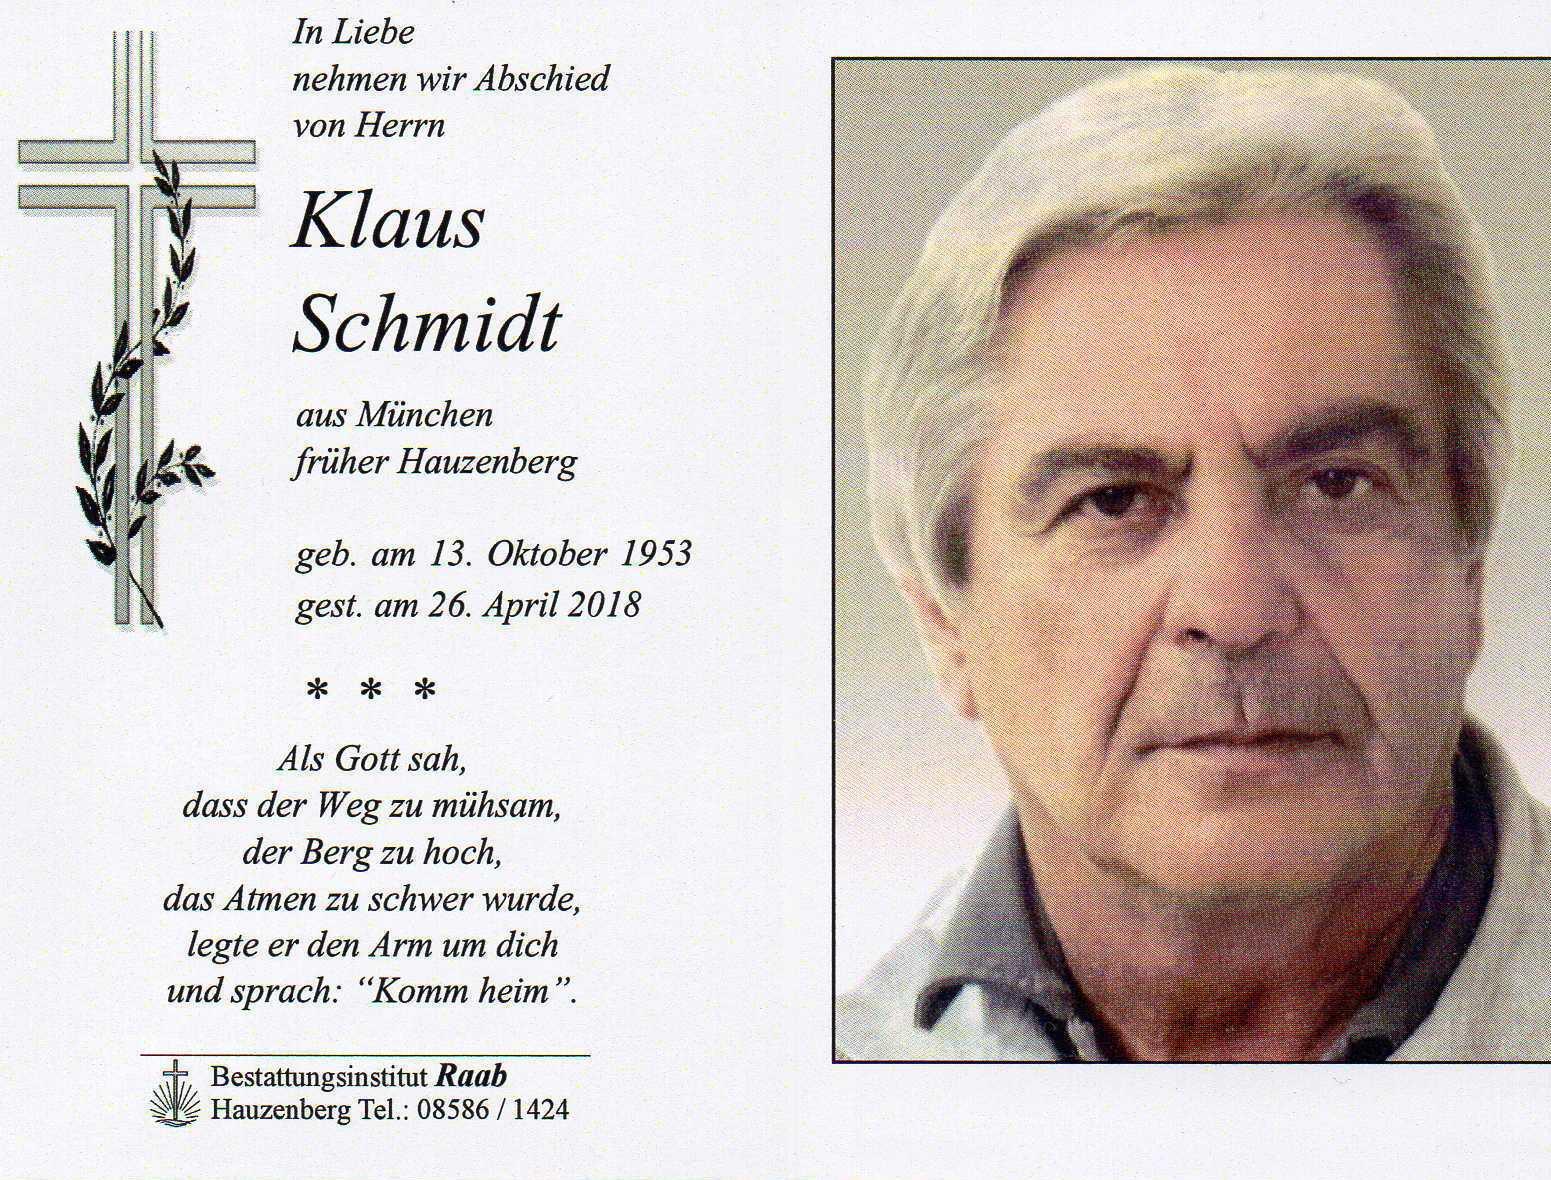 2018-04-26-Schmidt-Klaus-München-Hauzenberg